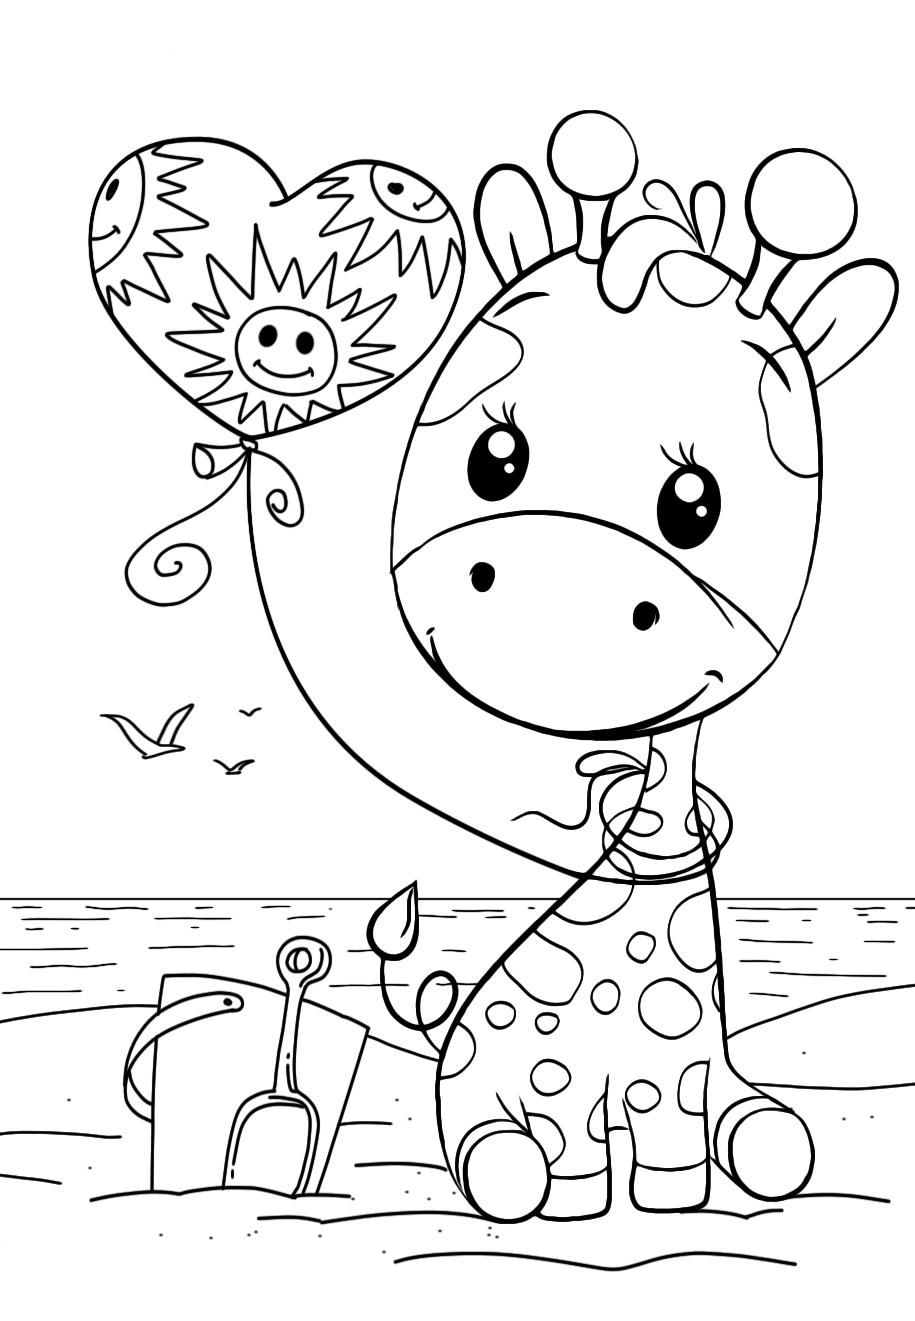 Жирафик - Милашки - Раскраски антистресс